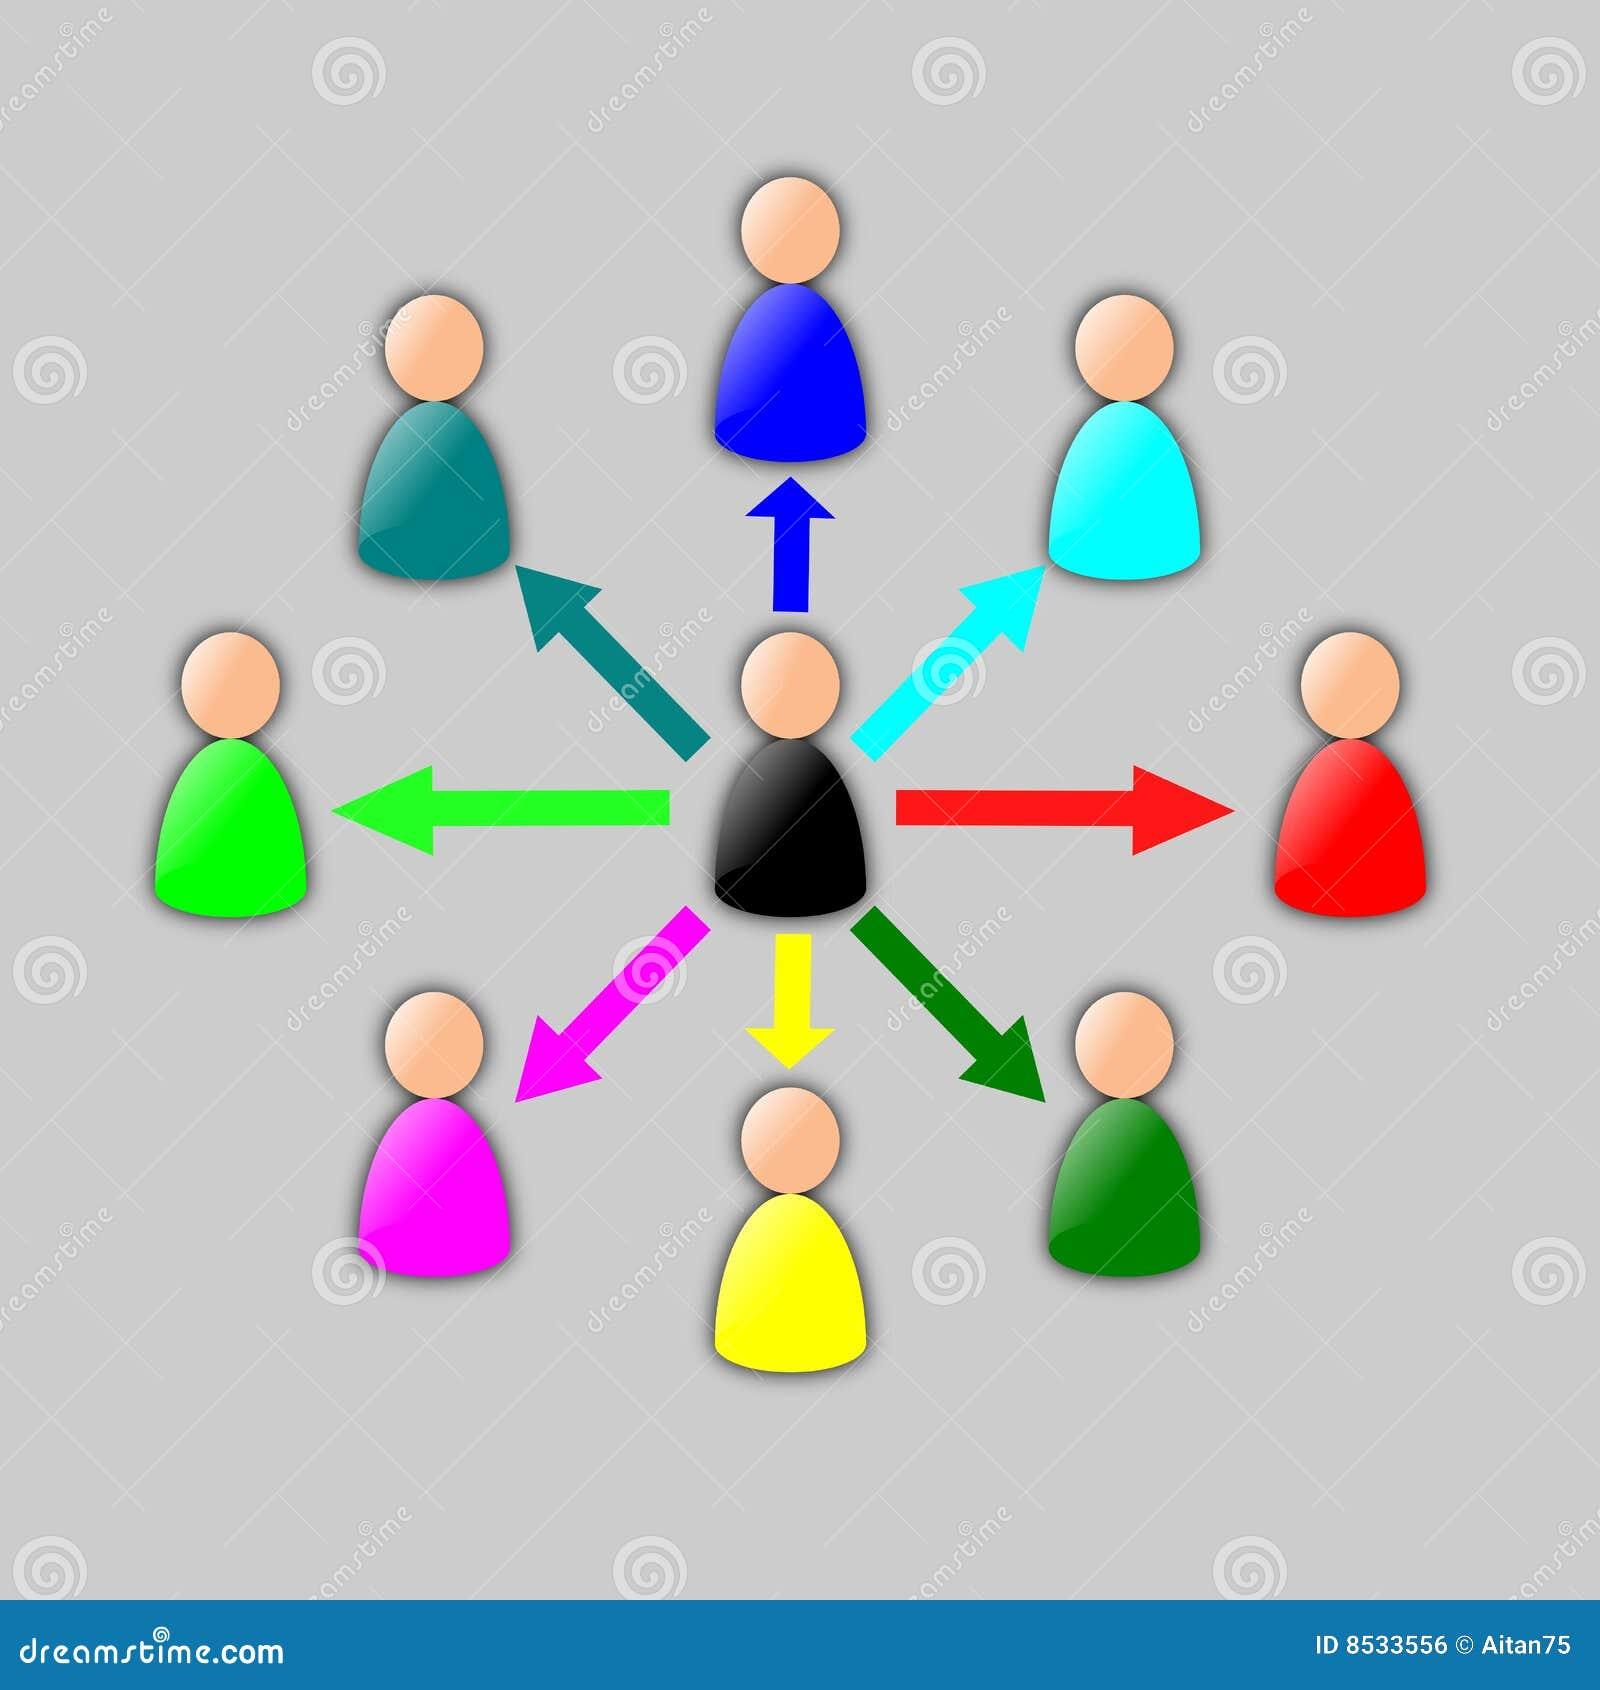 collaboration diagram stock illustration  image of